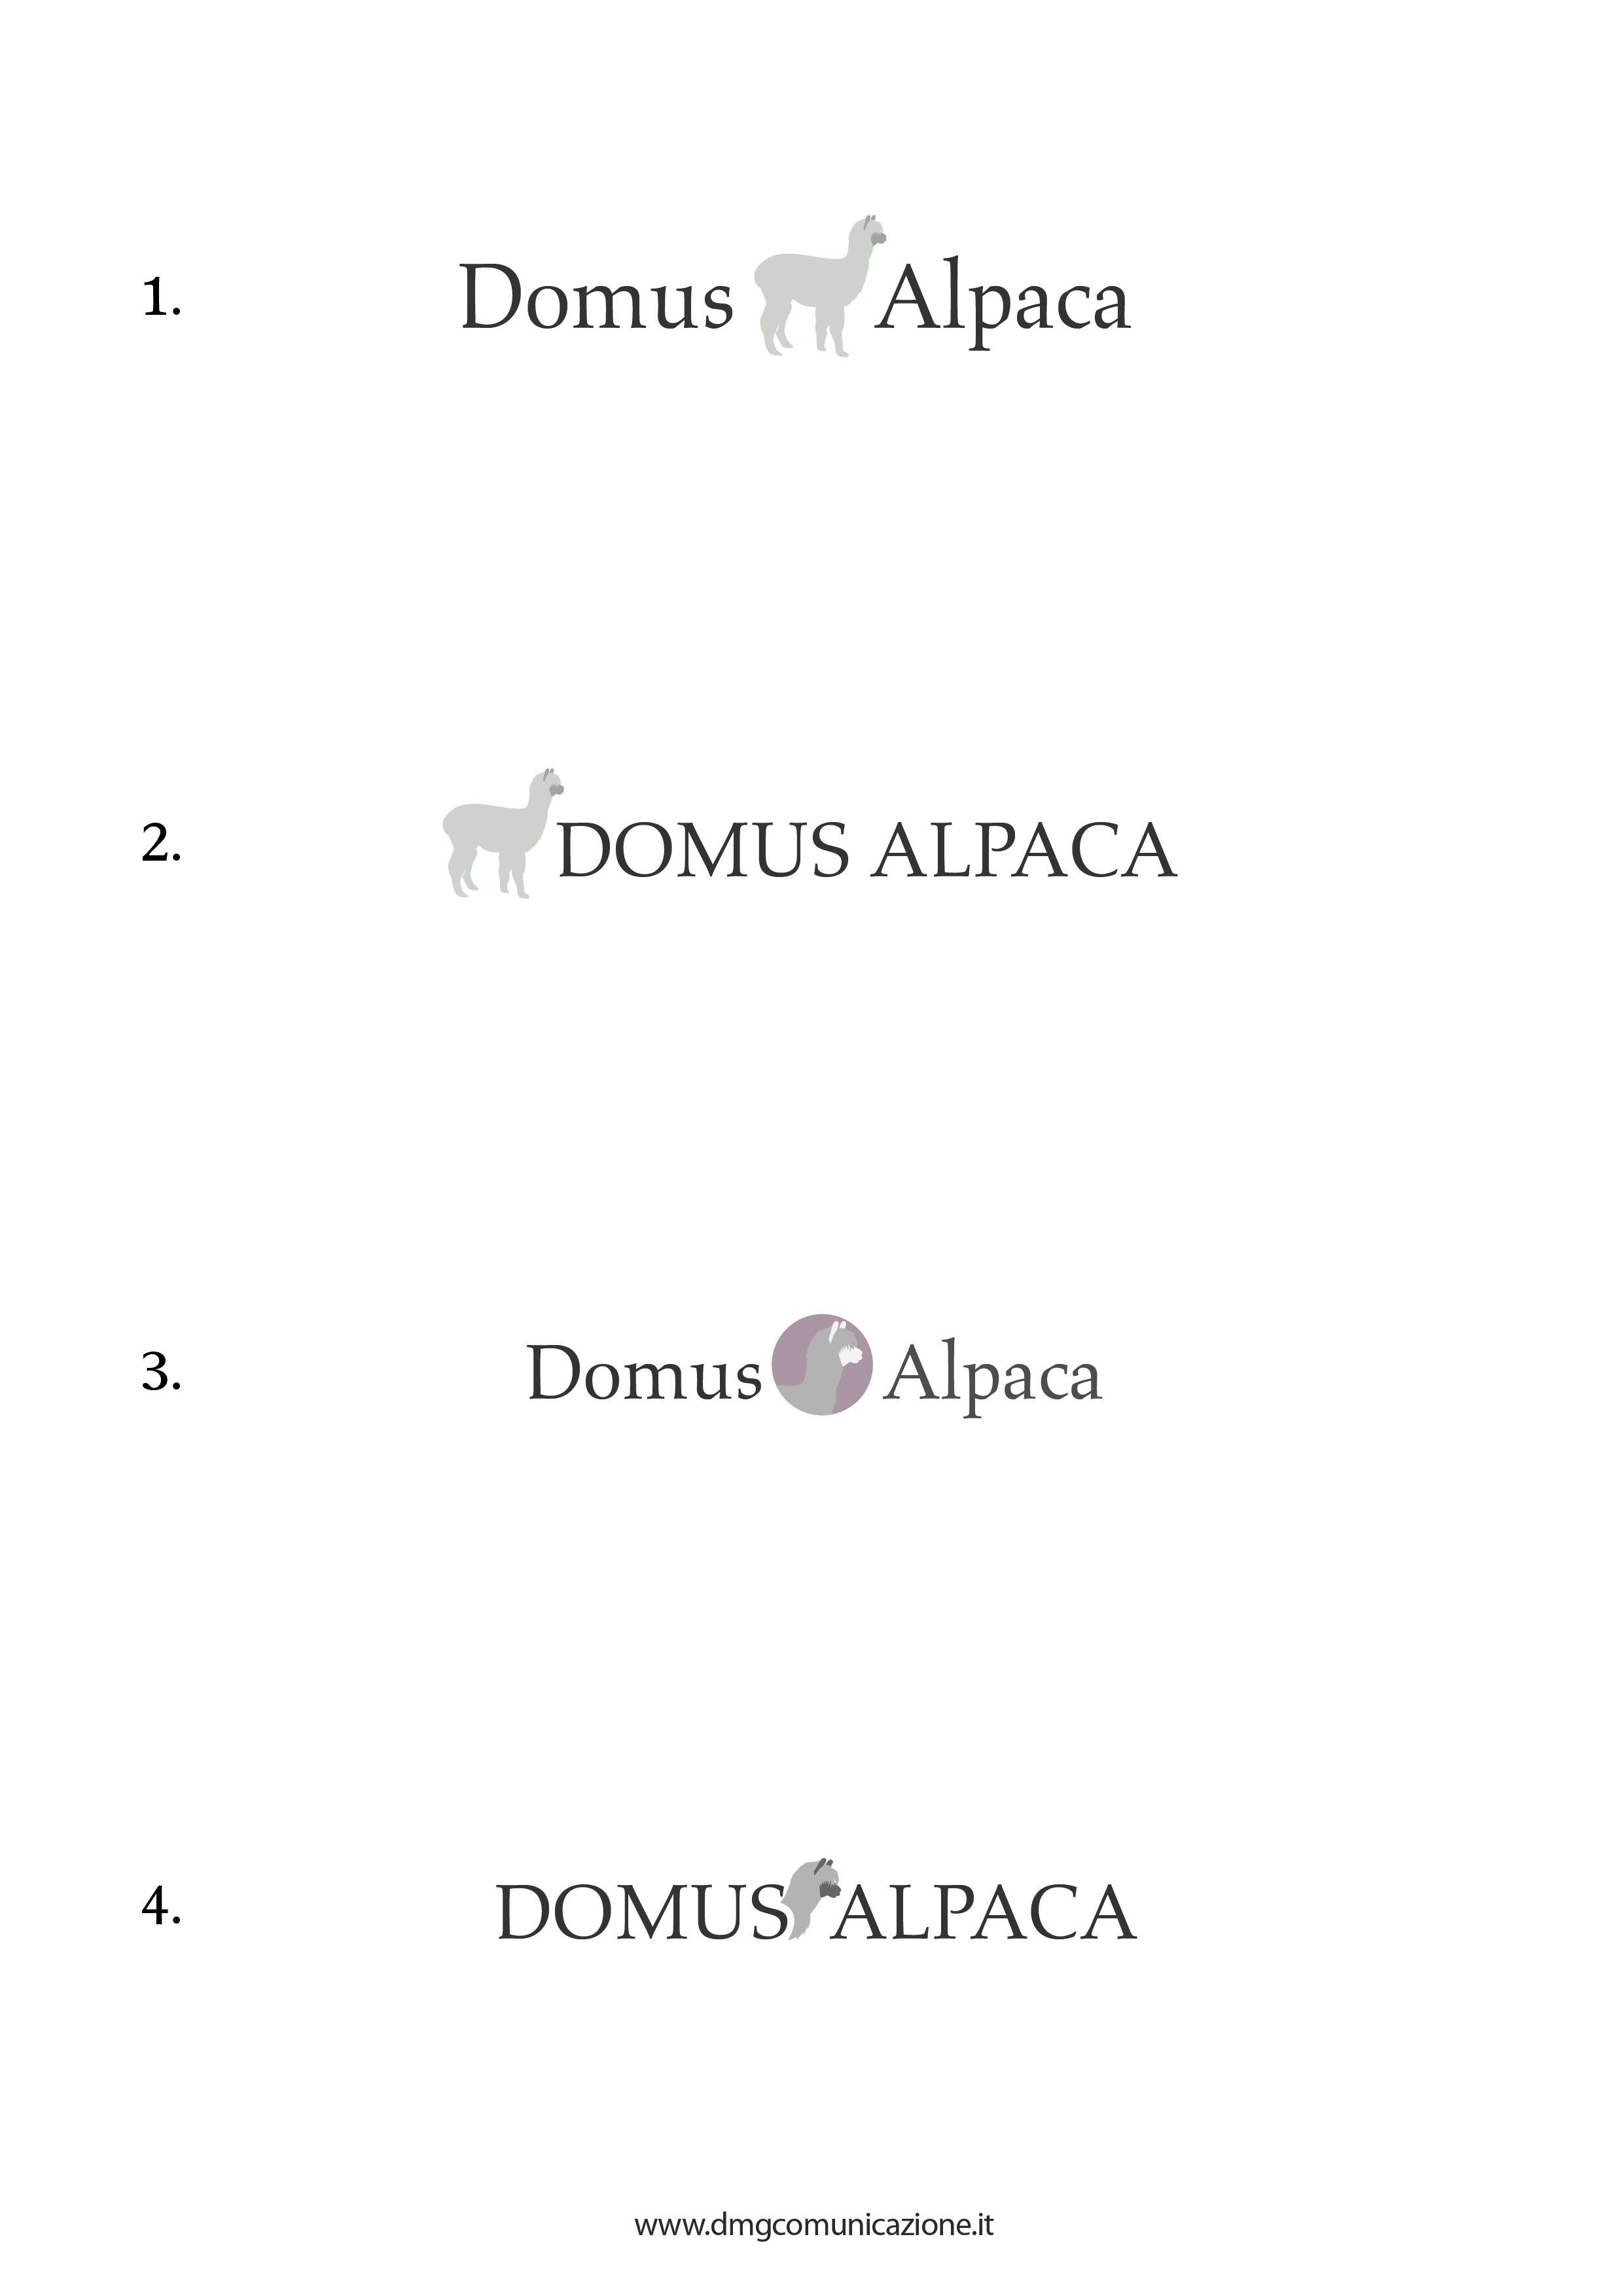 Domus Alpaca: rebranding